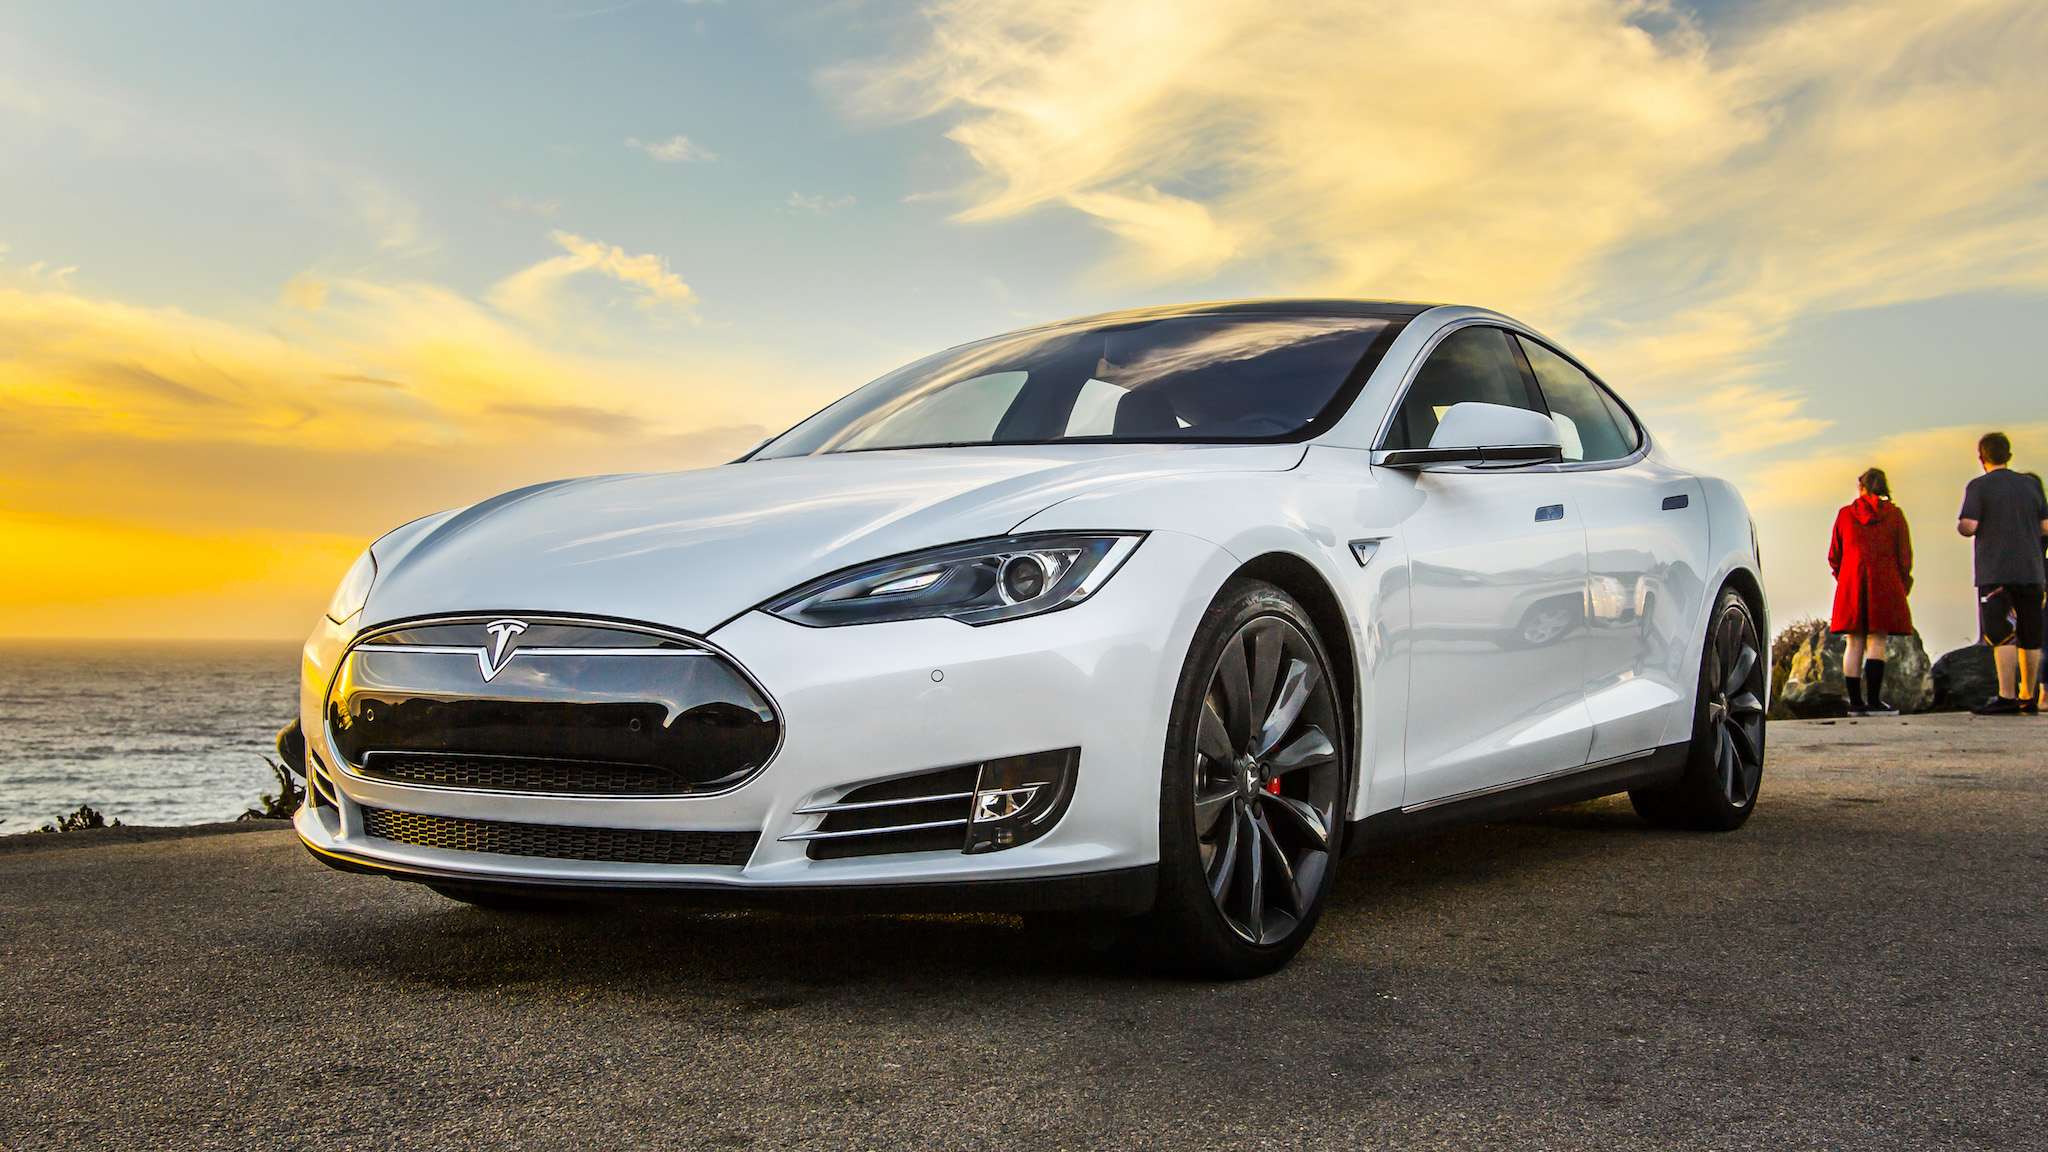 Subaru Dealers Sydney >> Tesla's dealership-free model to change local landscape - photos | CarAdvice